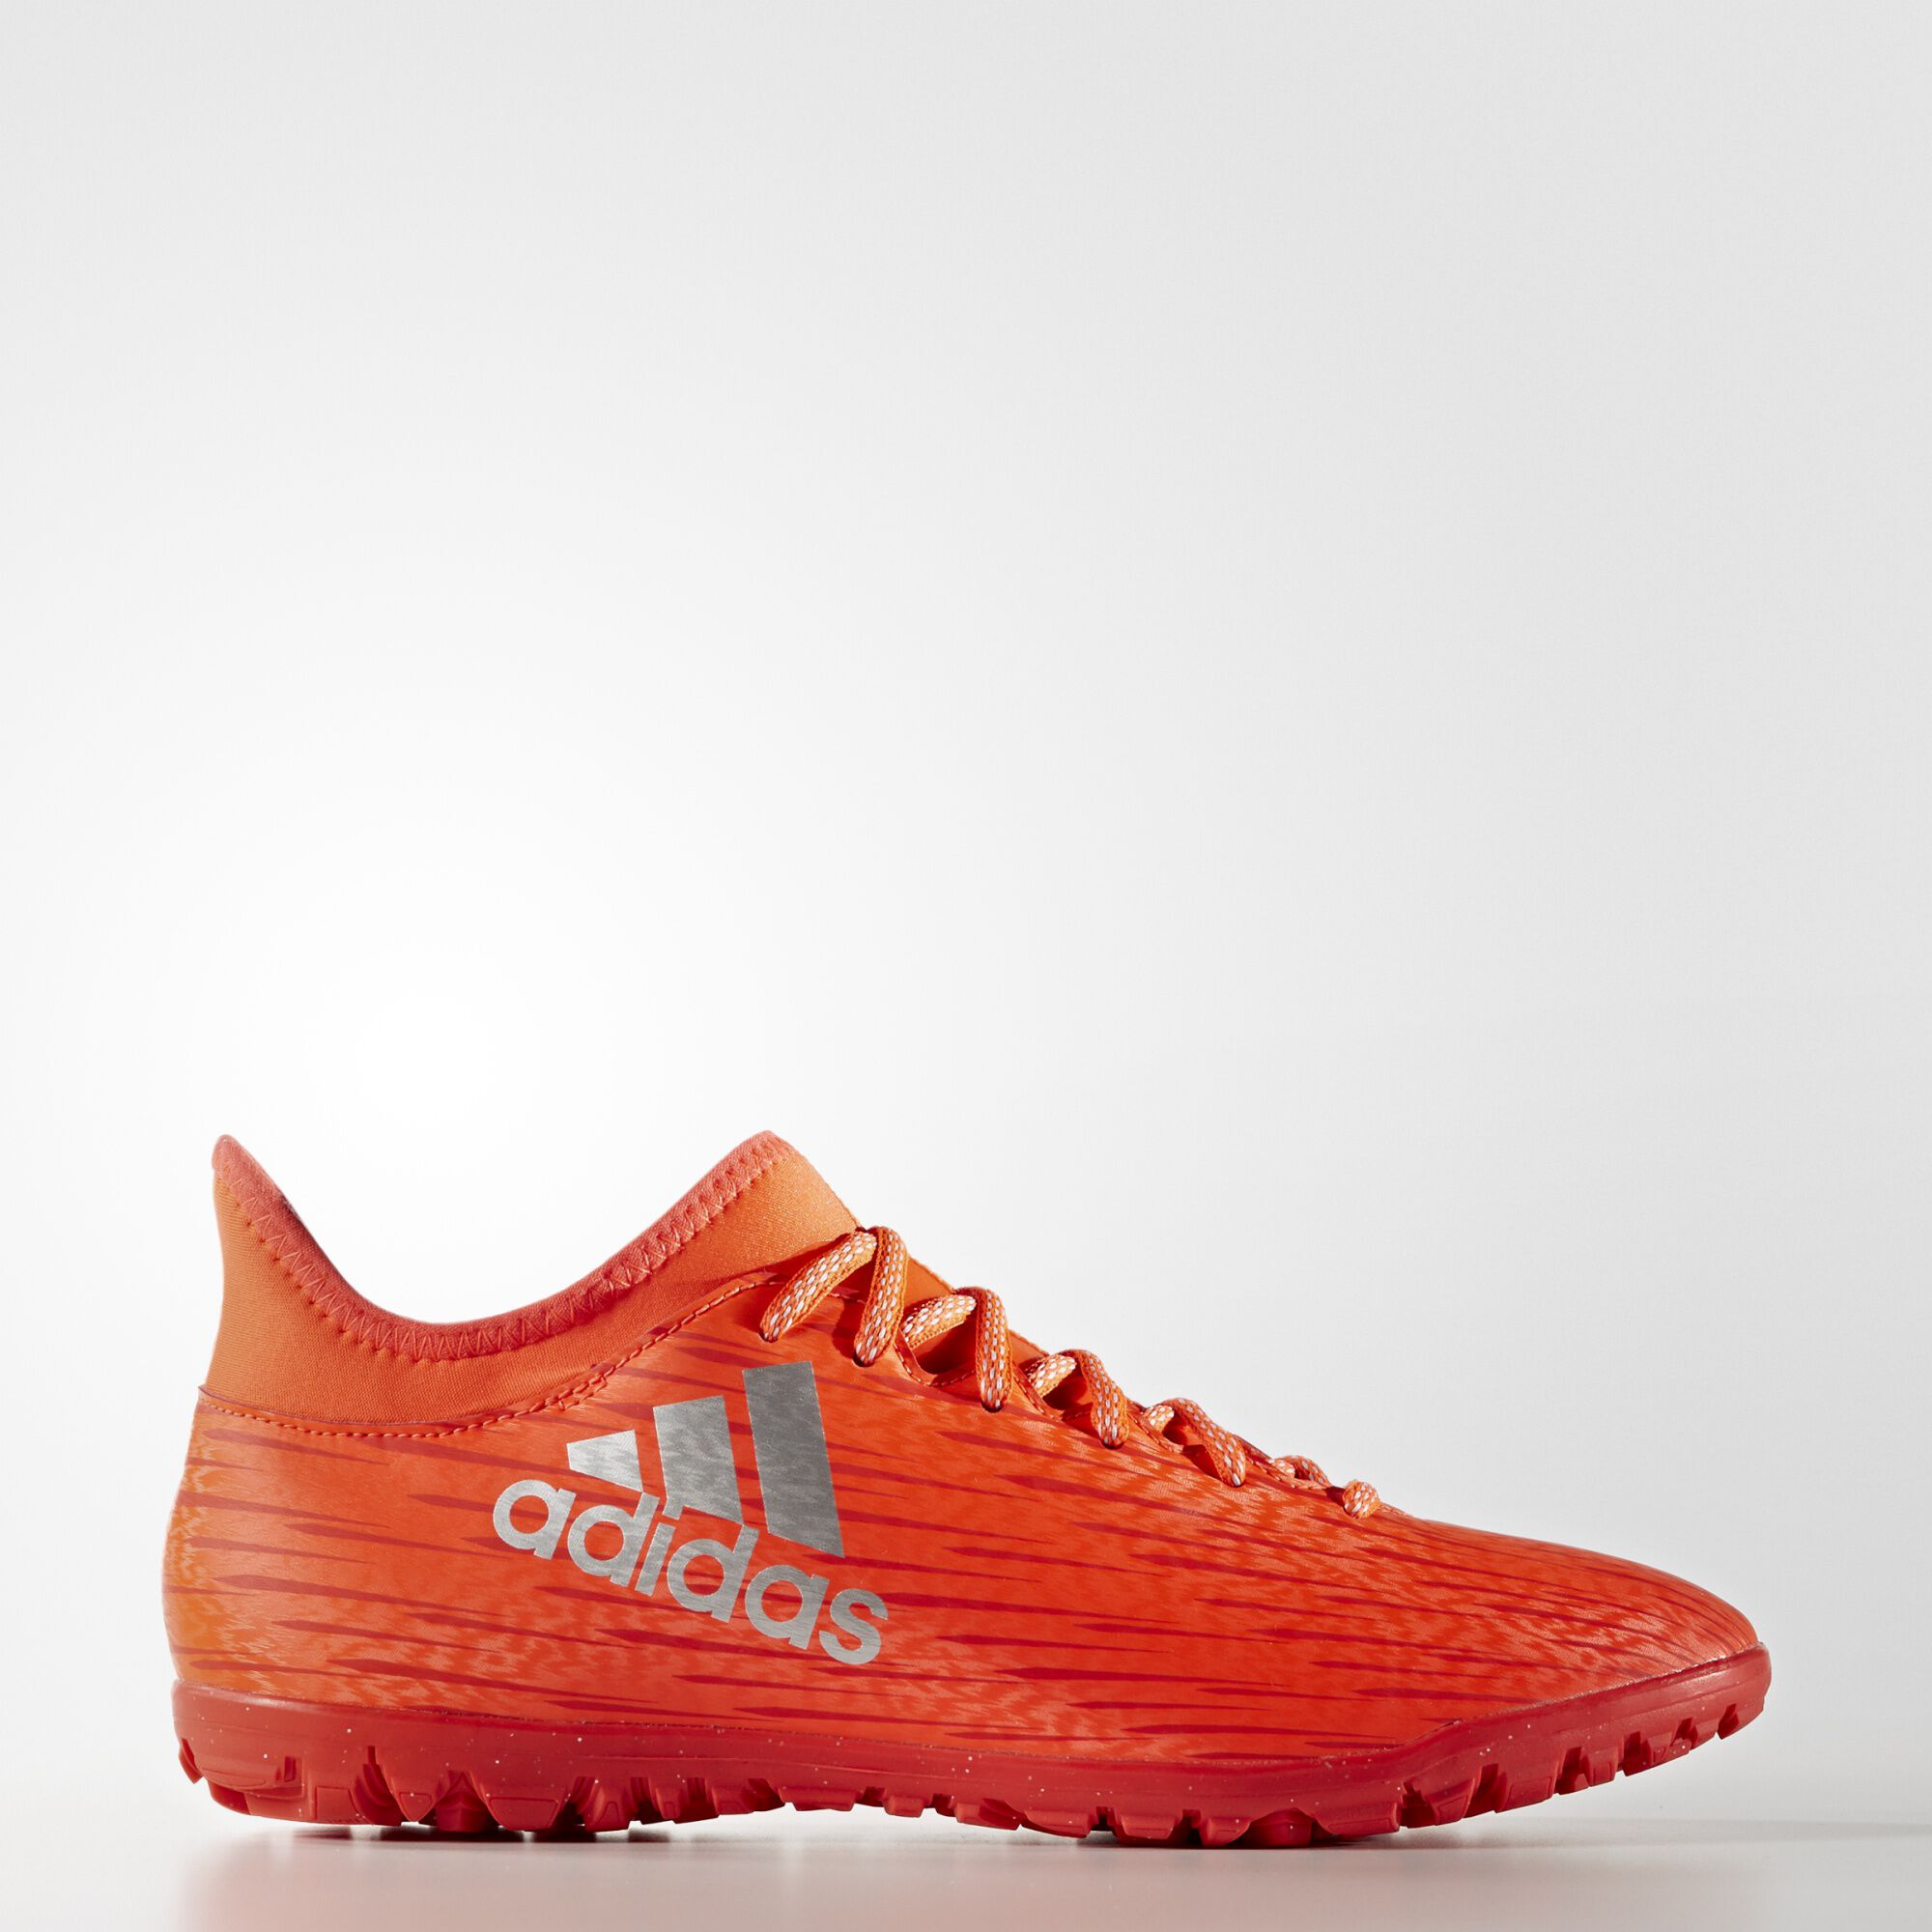 Espana-cg2ik-u4scir-Zapatillas-Futbol-Para-Moqueta-Turf-Adidas-X163-TF- Electrica-Naranja-Verde 50425 zapatillas adidas x16 047c53b46a5a7